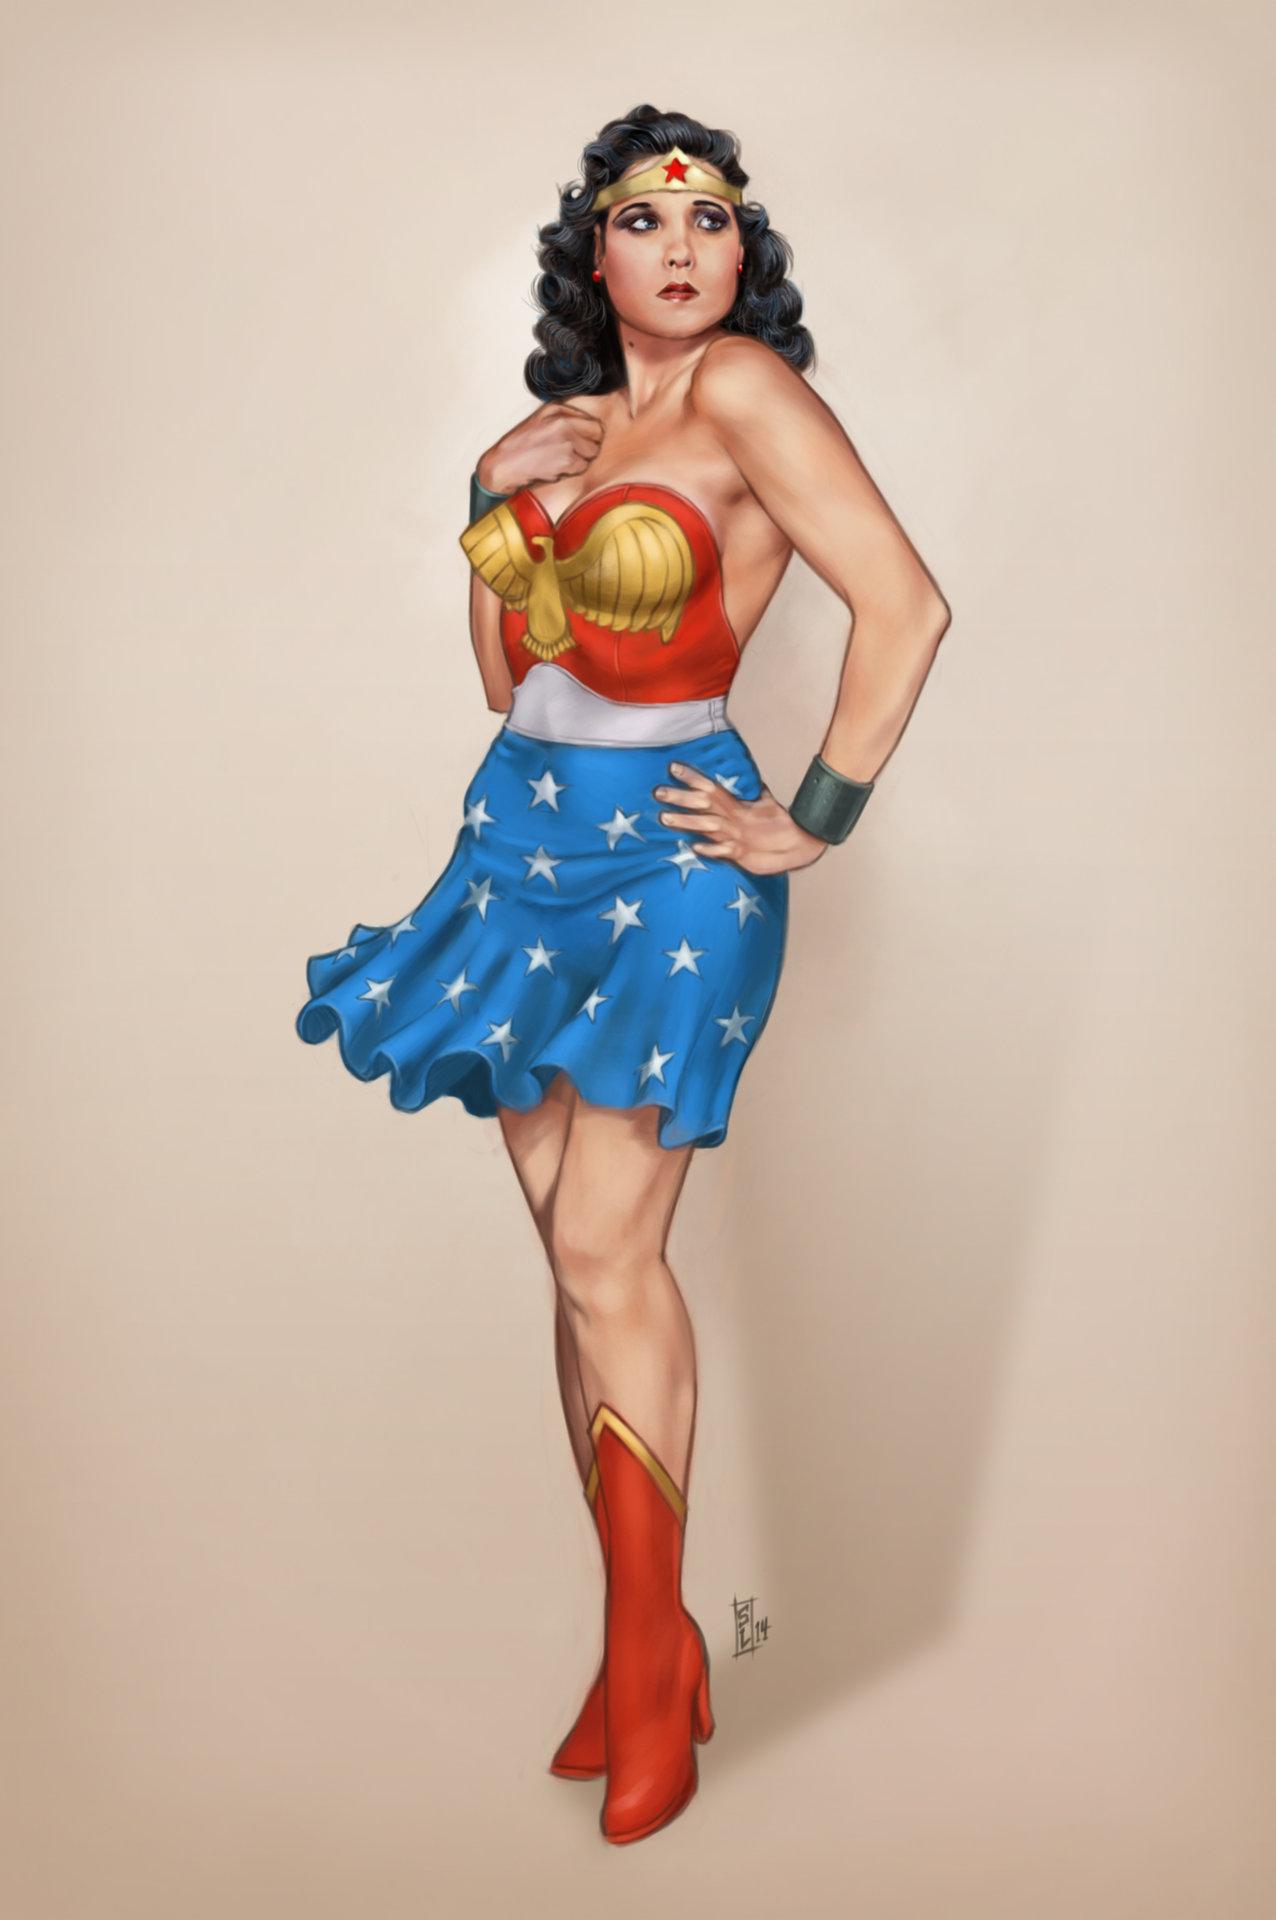 classy-female-superhero-pin-up-art-by-stephen-langmead1